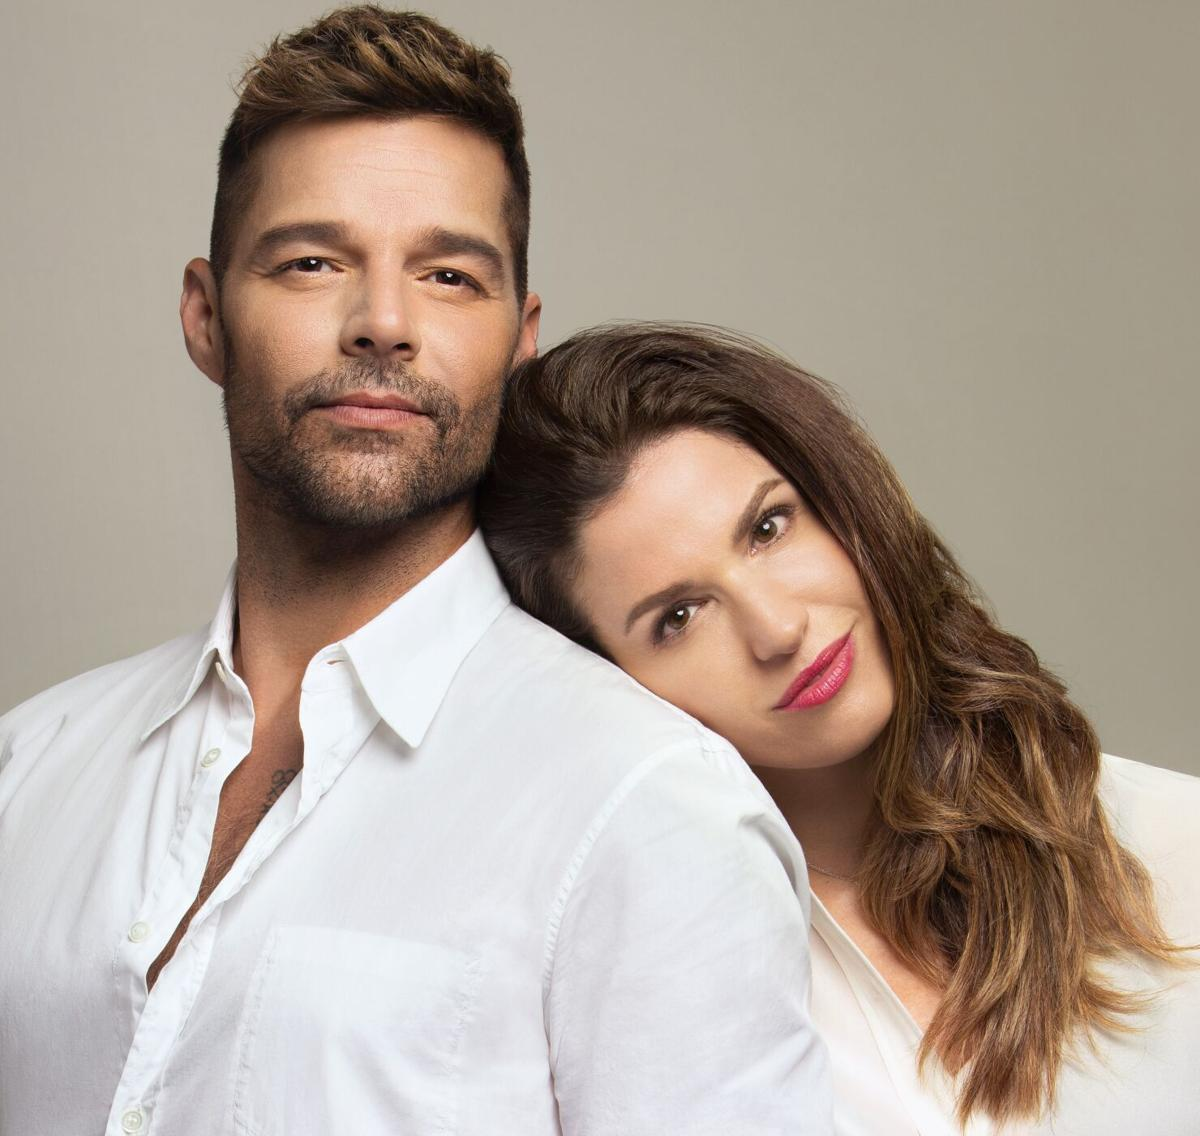 Ricky Martin y Catalina Aguirre